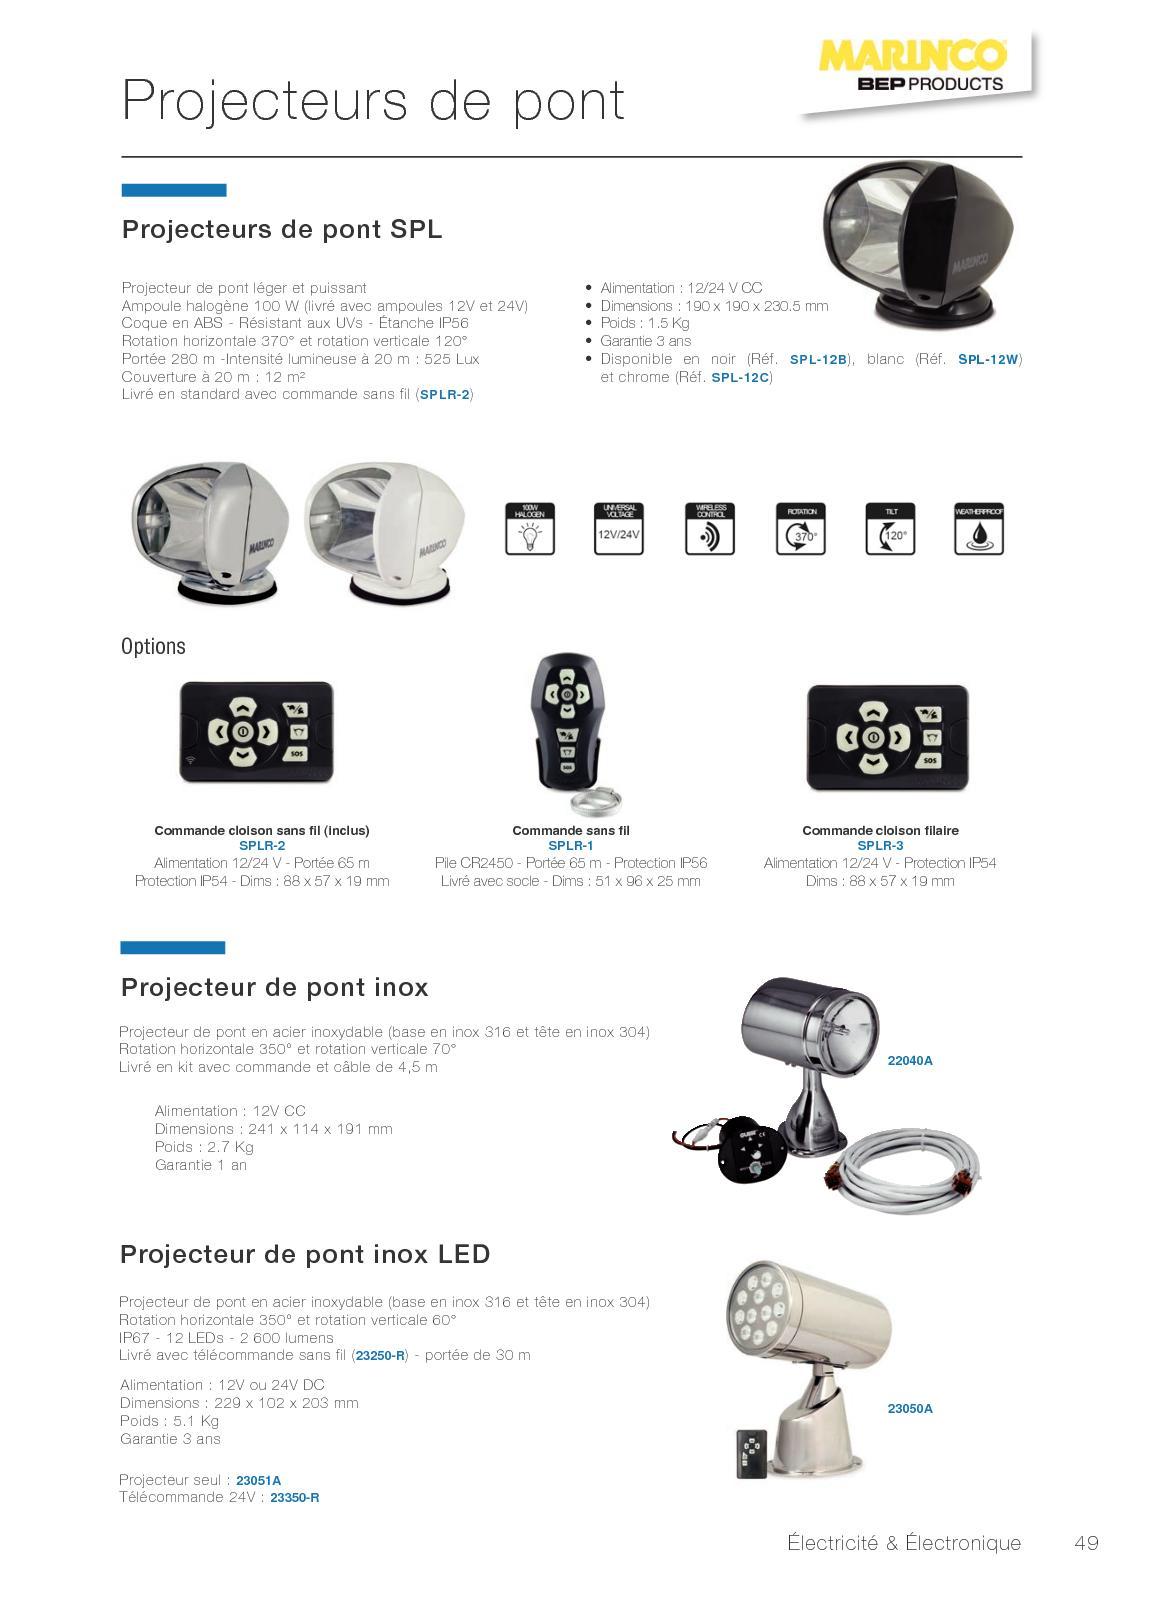 Catalogue 2018 Calameo Downloader Marinco 24 Volt Wiring Diagram Page 49